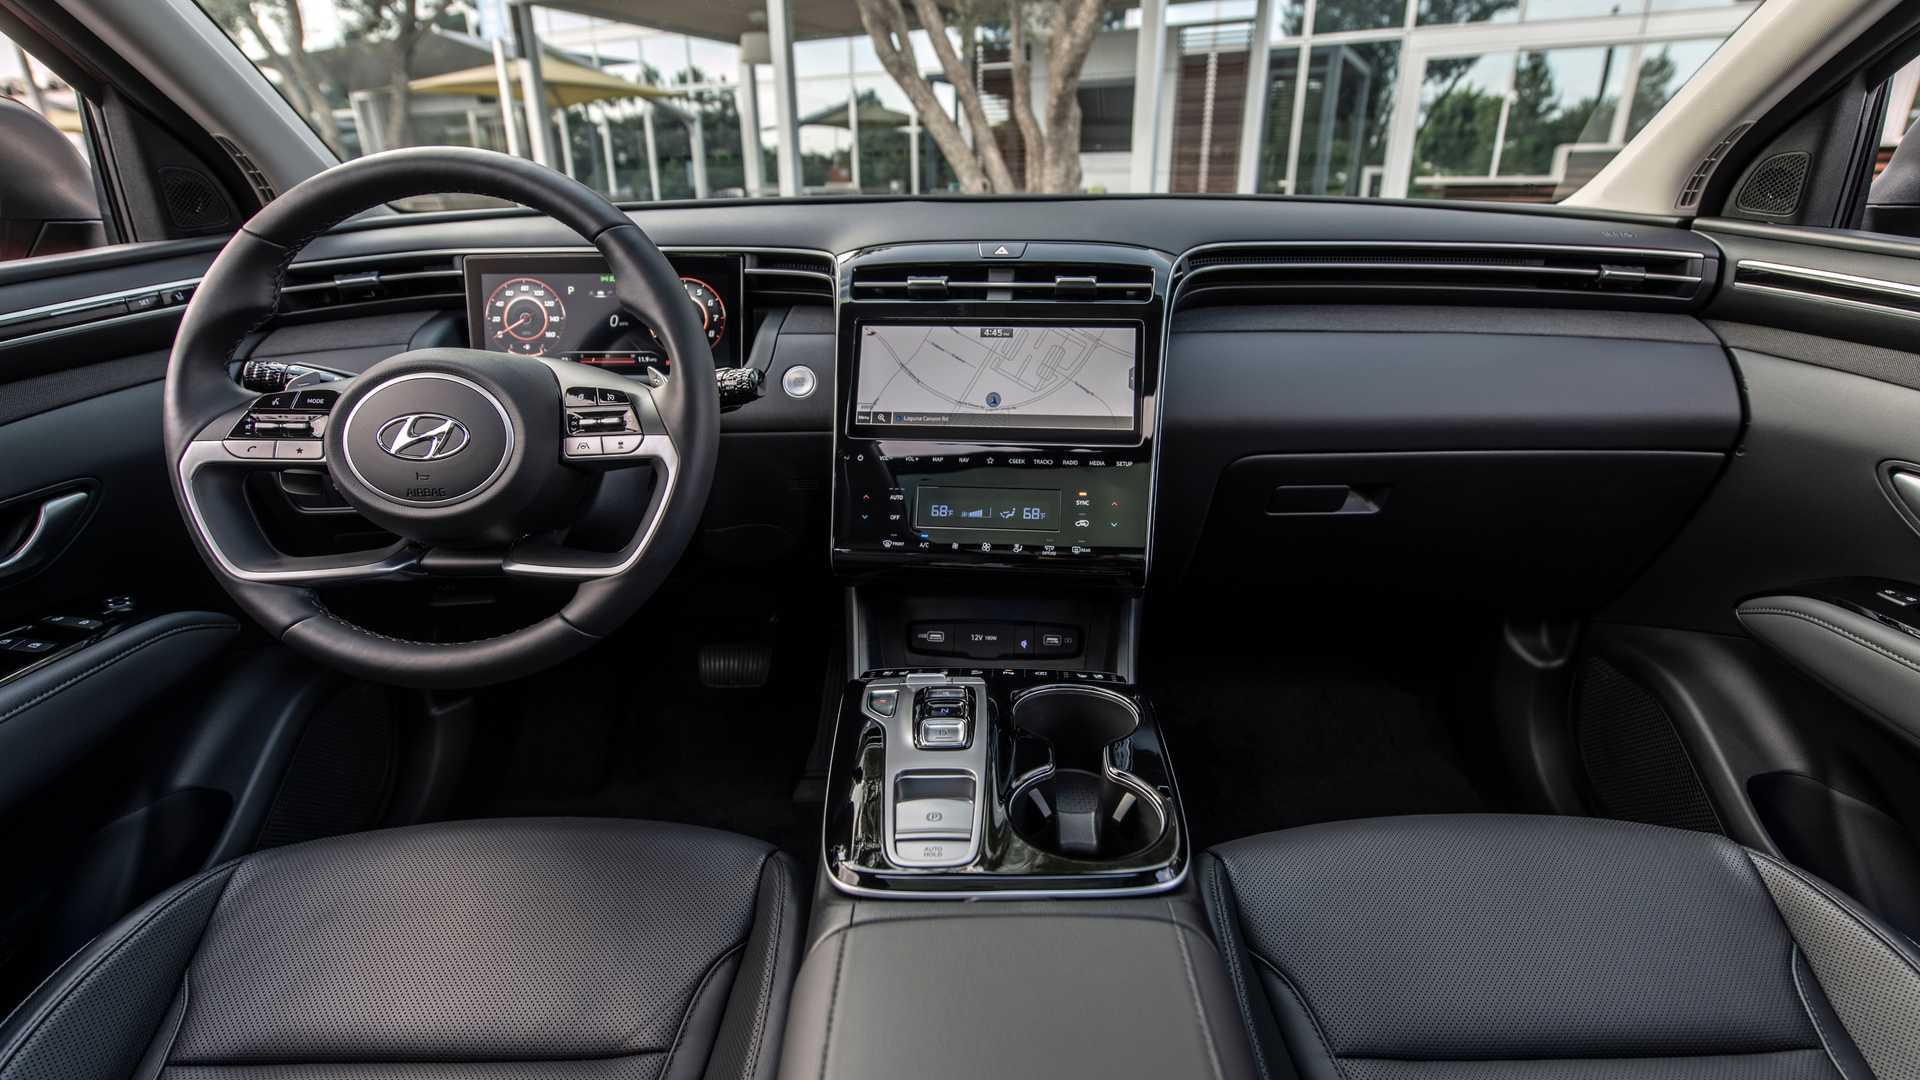 The All New US-Spec Hyundai Tucson Unveiled 2